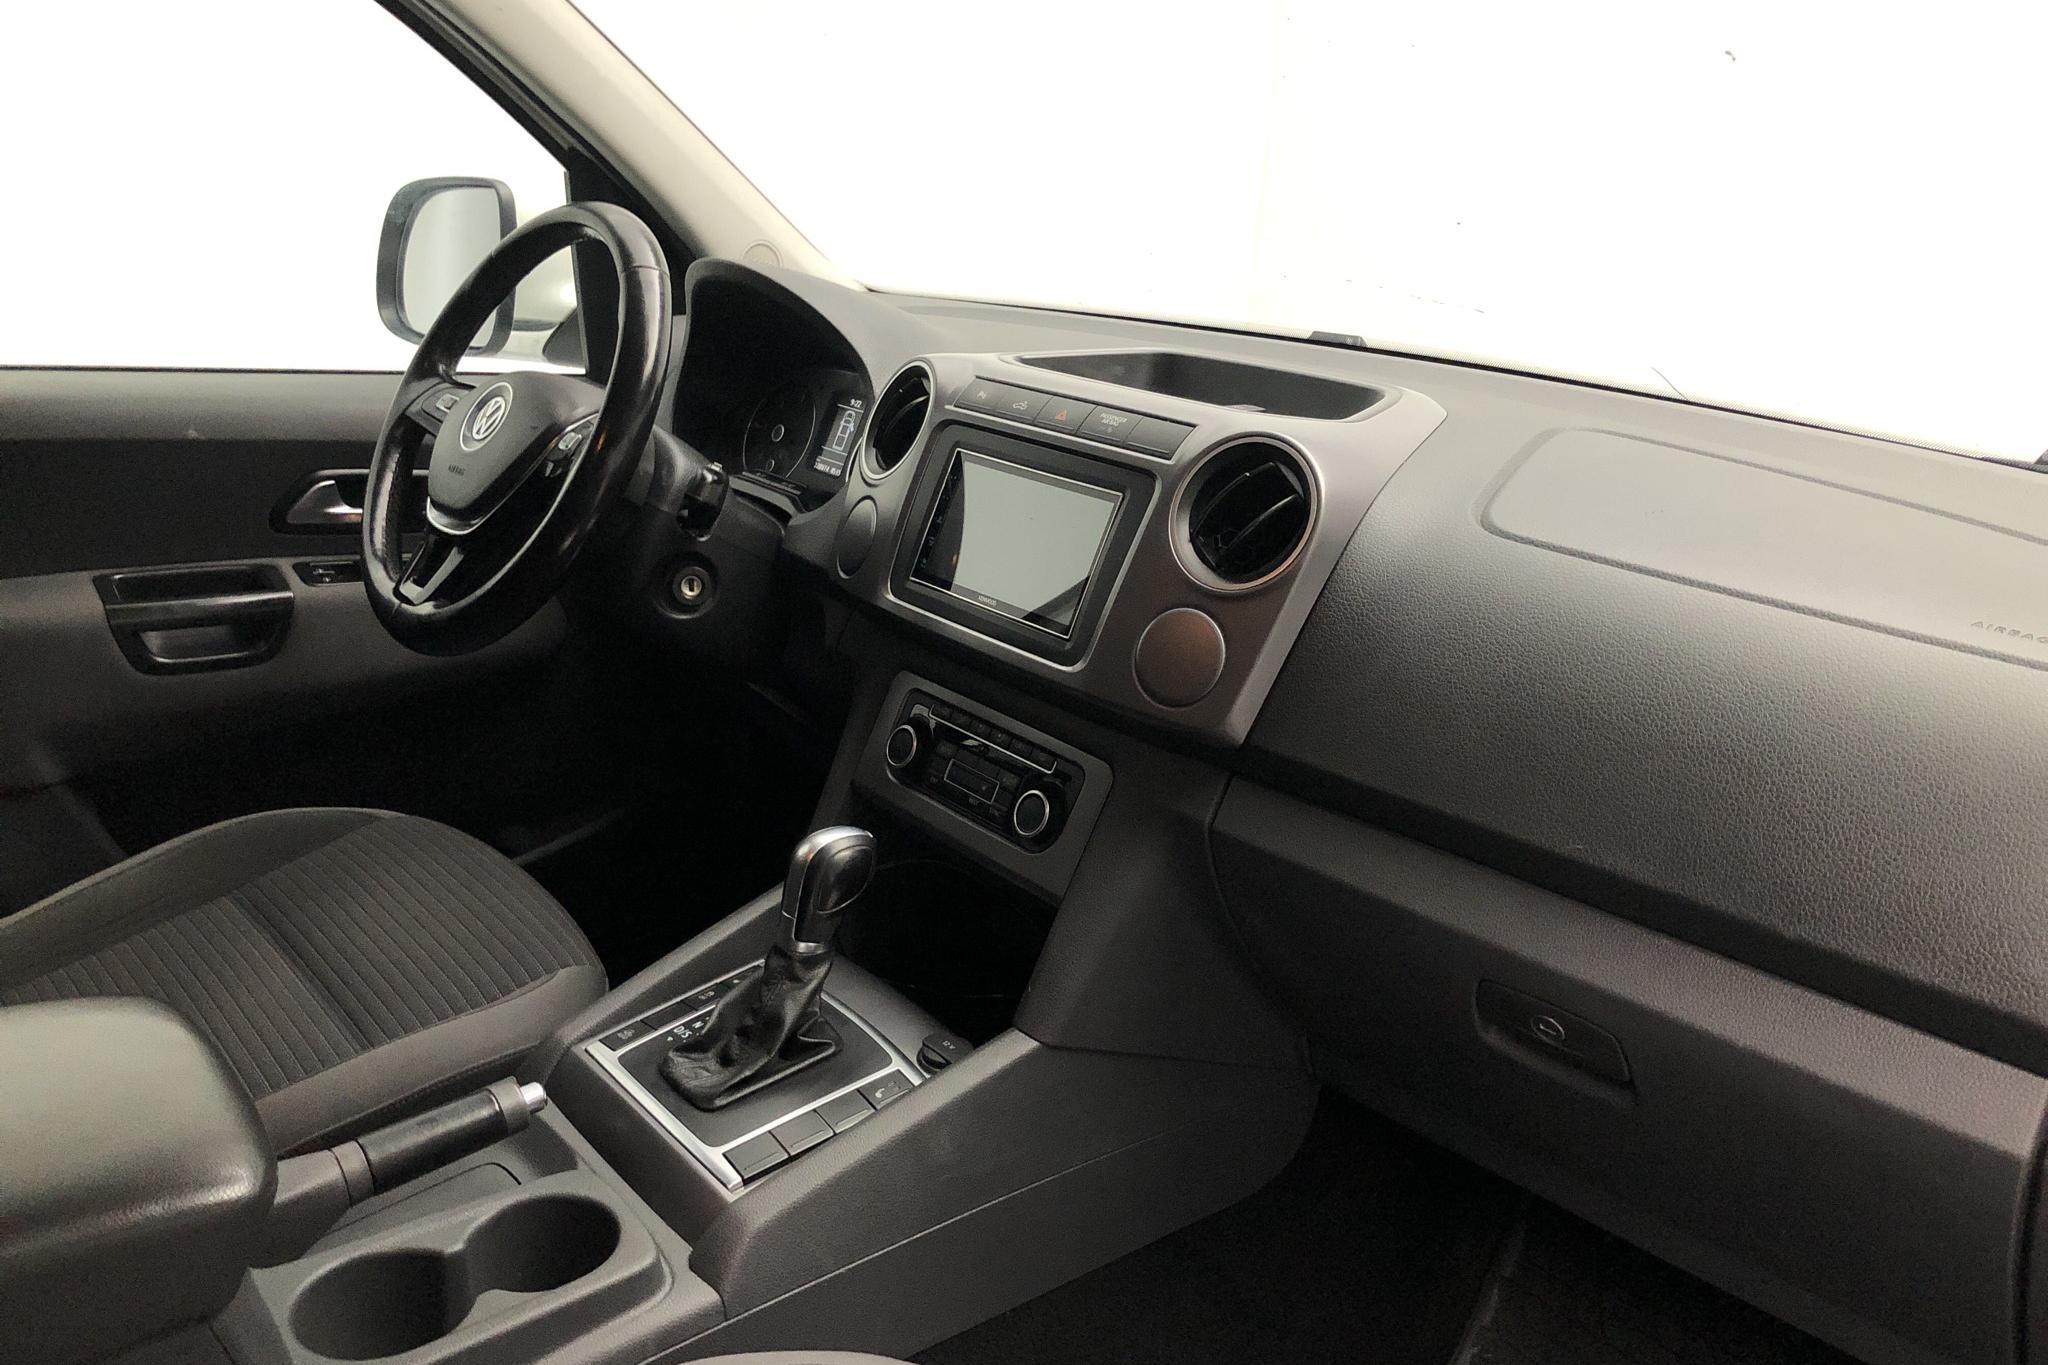 VW Amarok 2.0 TDI 4motion (180hk) - 228 070 km - Automatic - white - 2016